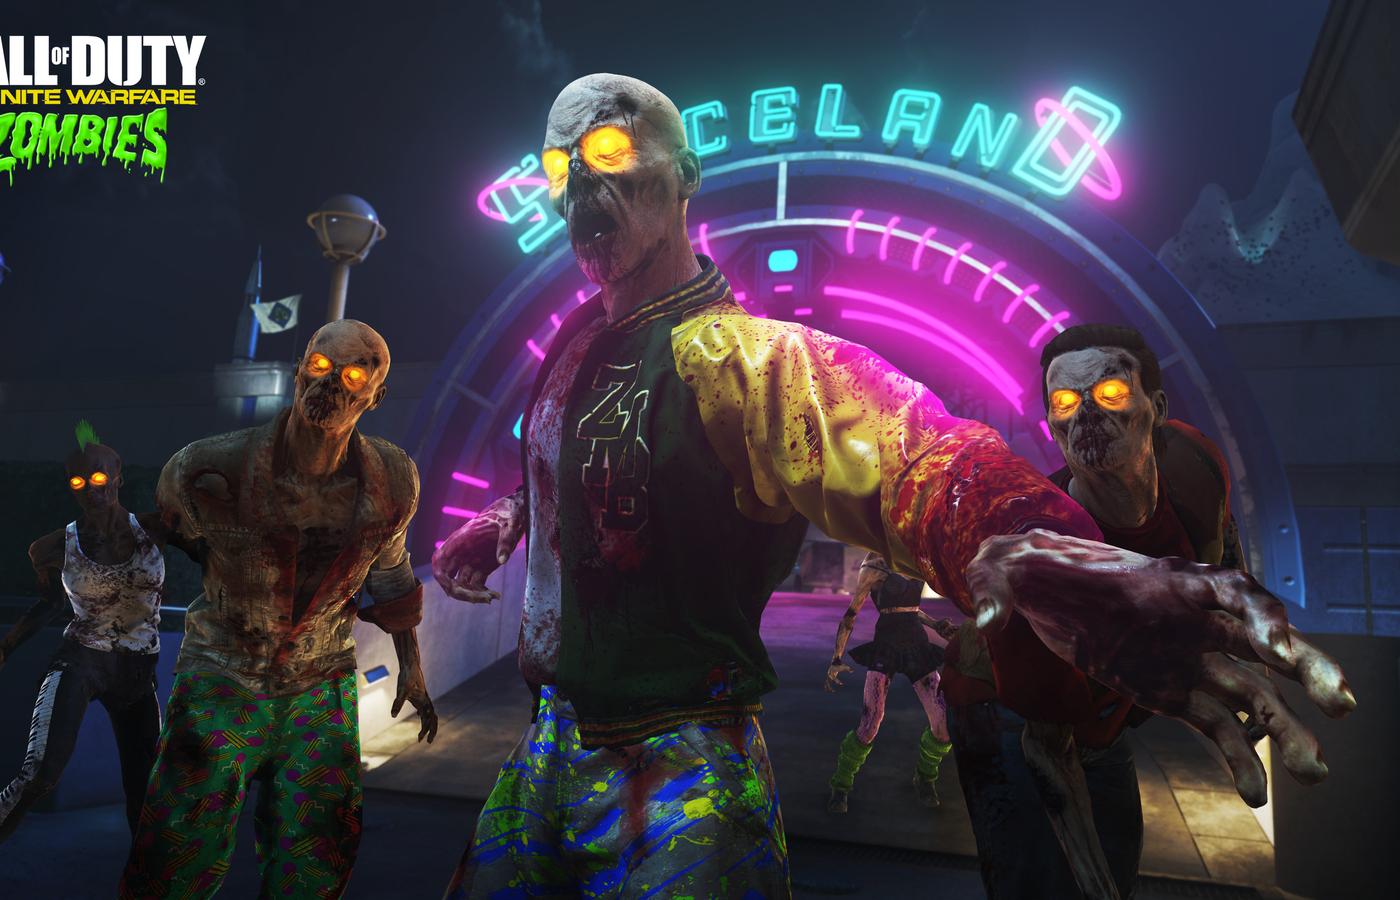 cod-infinite-warfare-zombies-in-spaceland-new.jpg